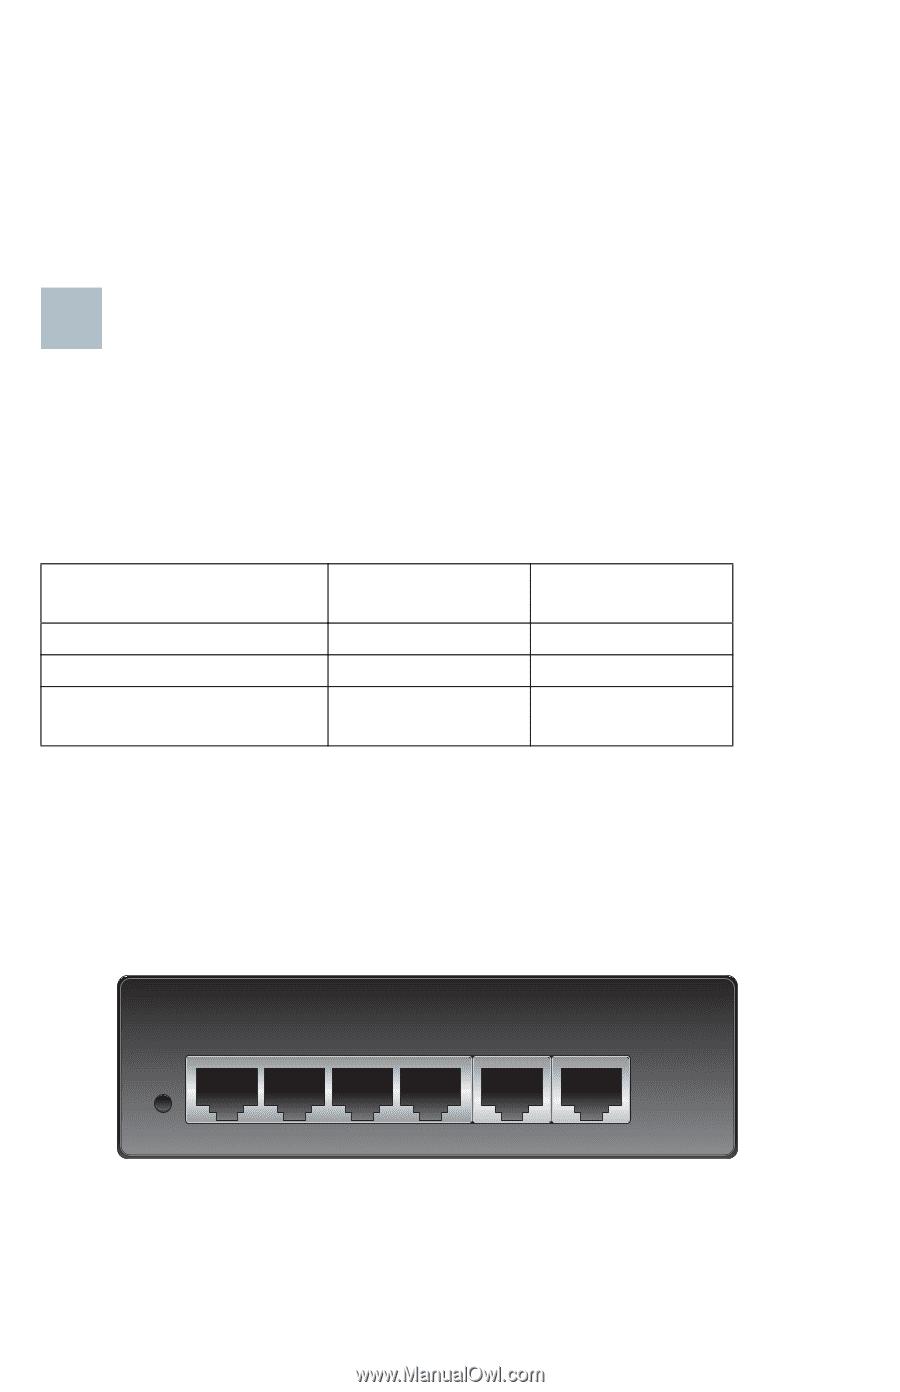 Cisco RV042 | Quick Start Guide - Page 4